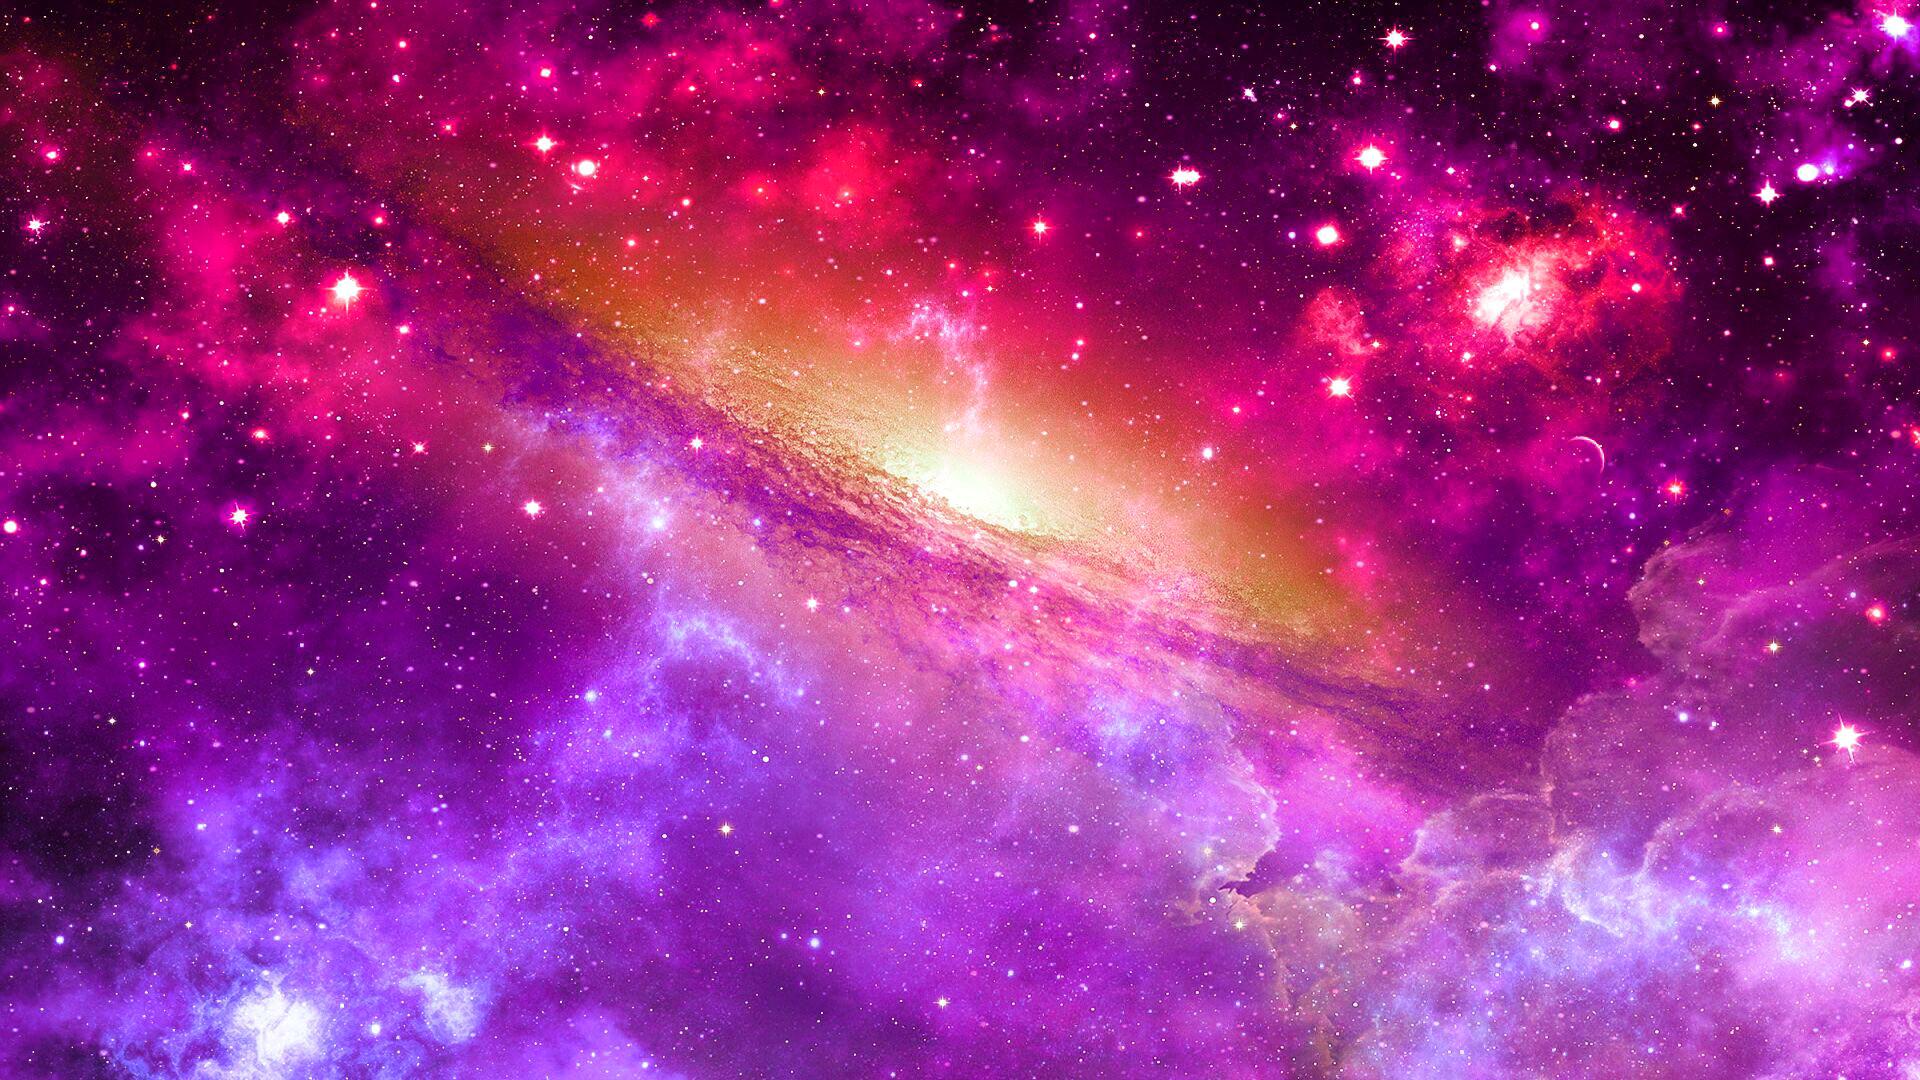 Wallpaper space, universe, nebula, star, light